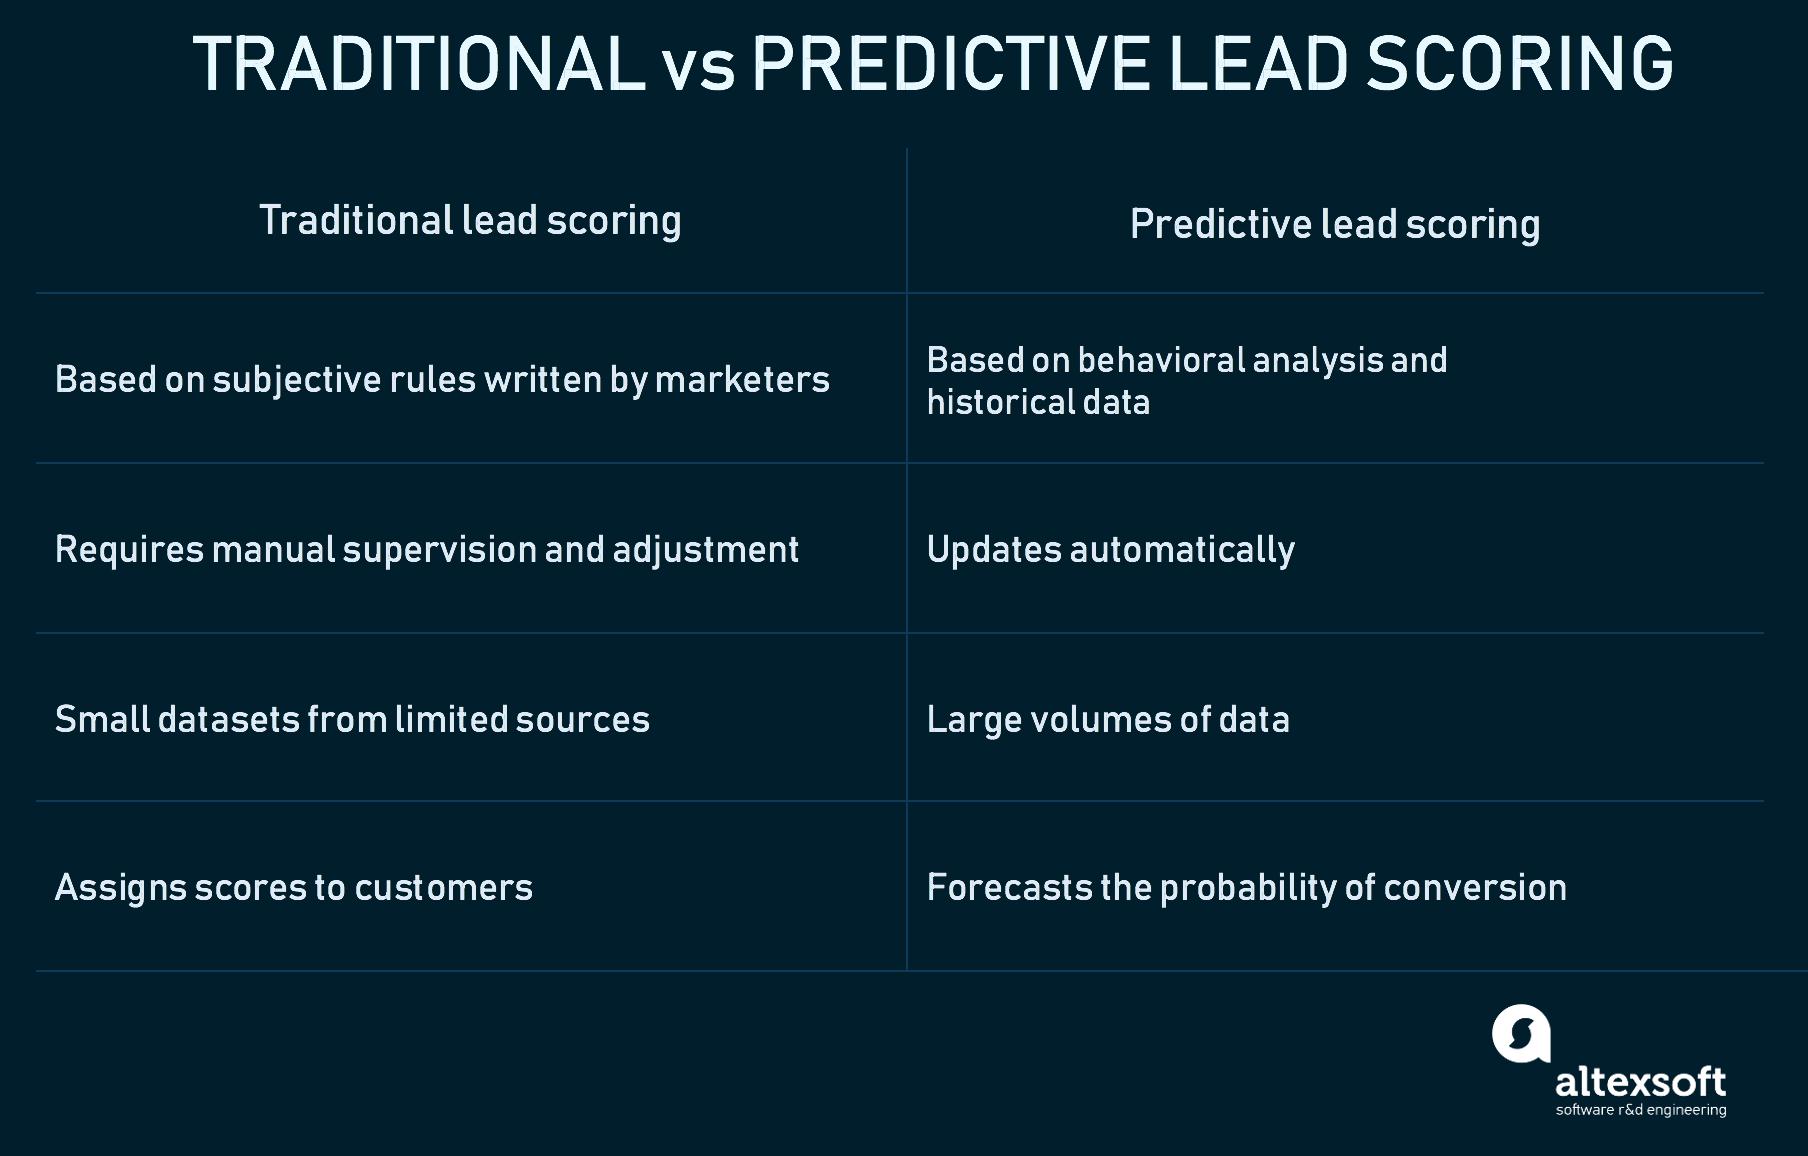 traditonal vs predictive lead scoring